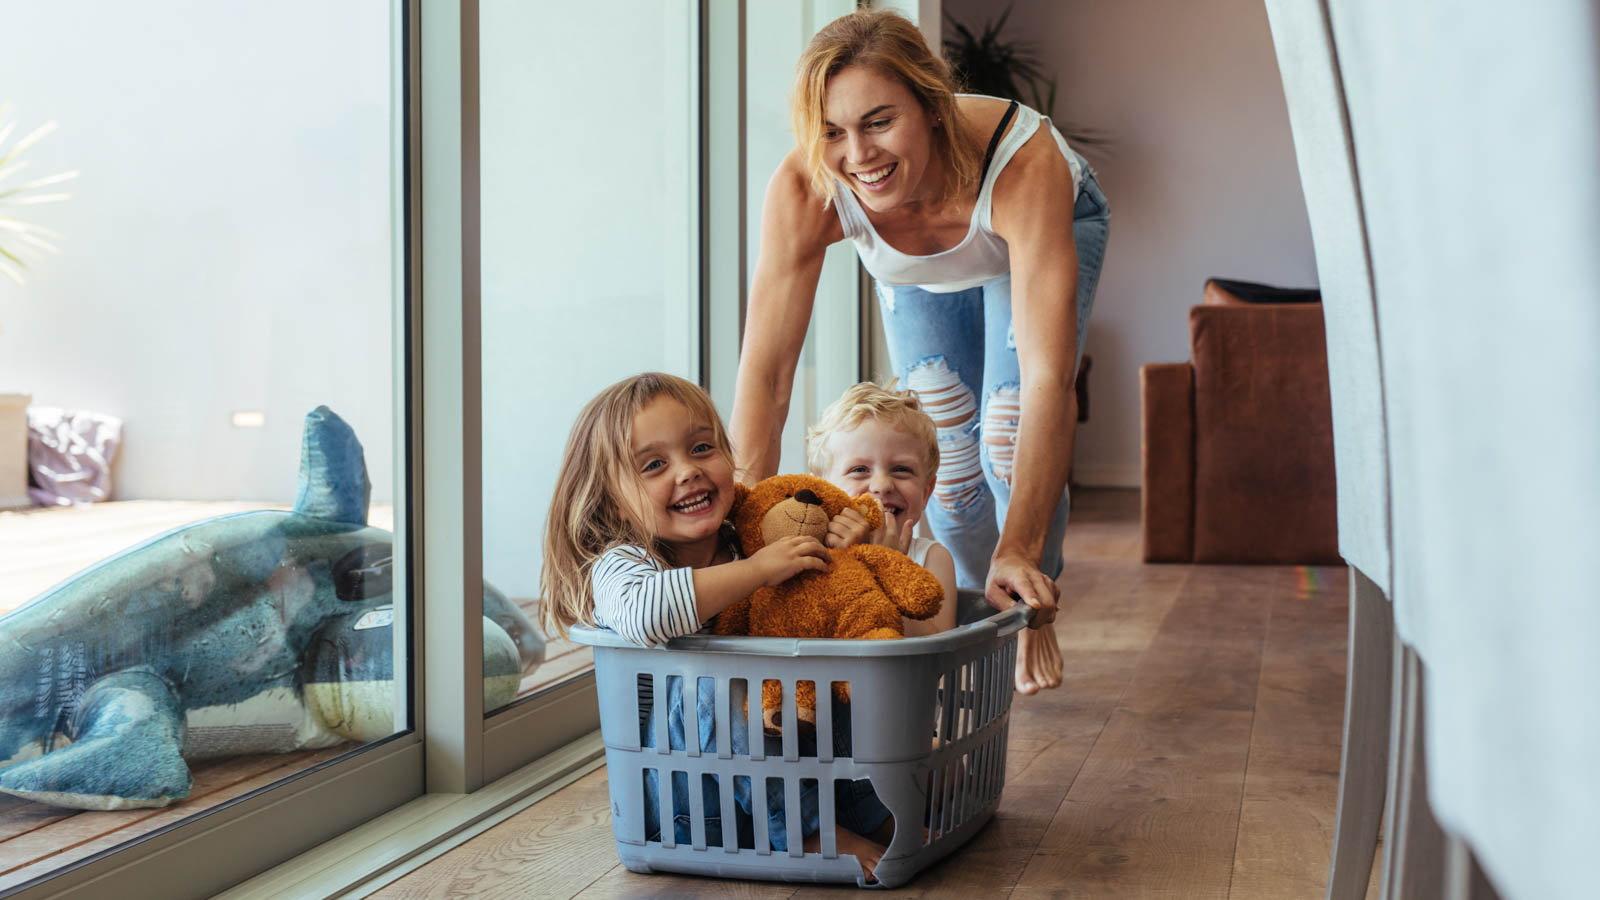 mom pushing kids around in laundry basket